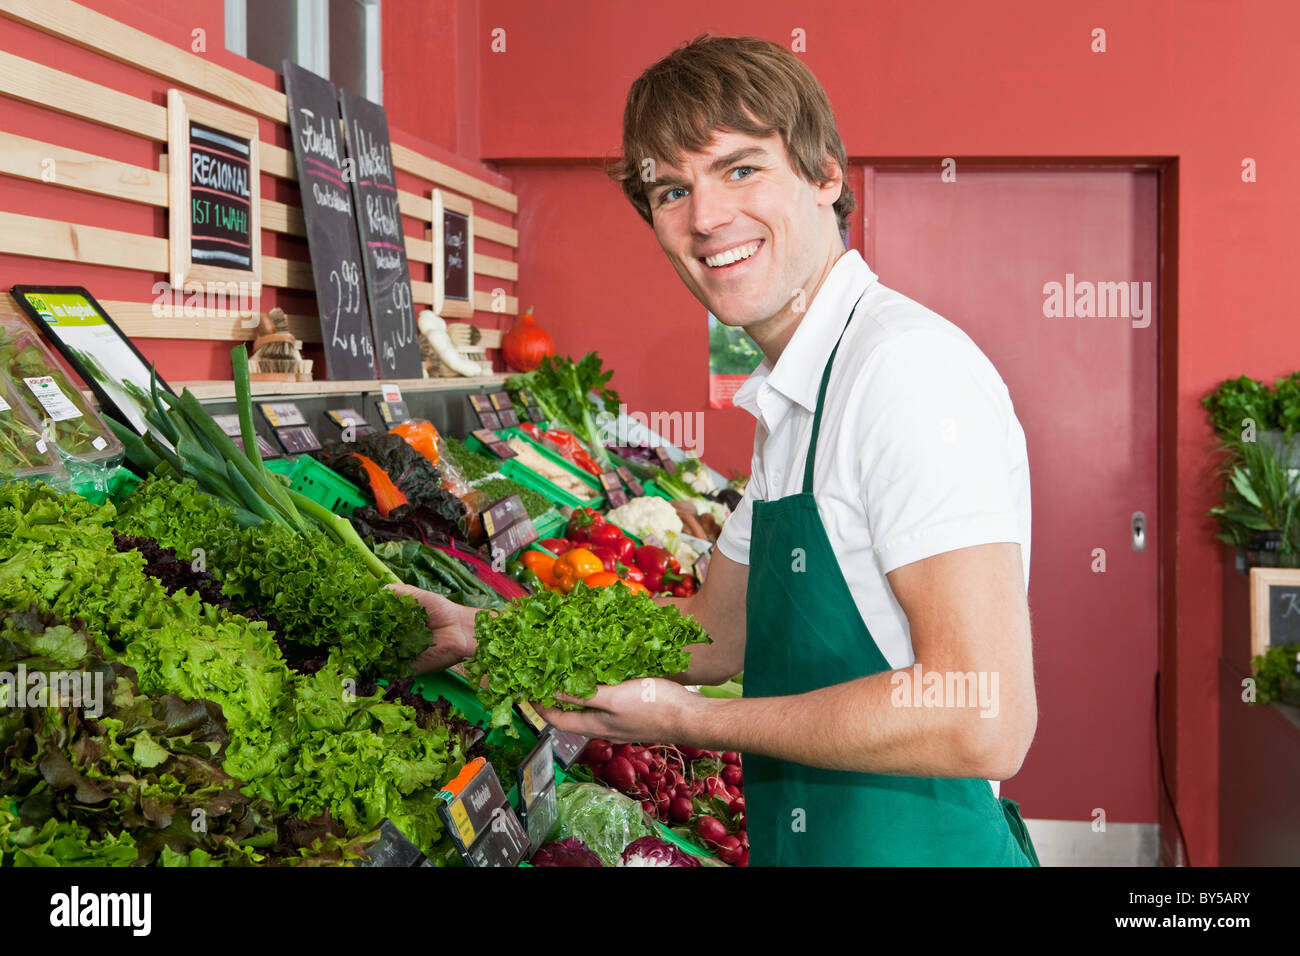 A grocery stocker stocking leaf lettuce - Stock Image